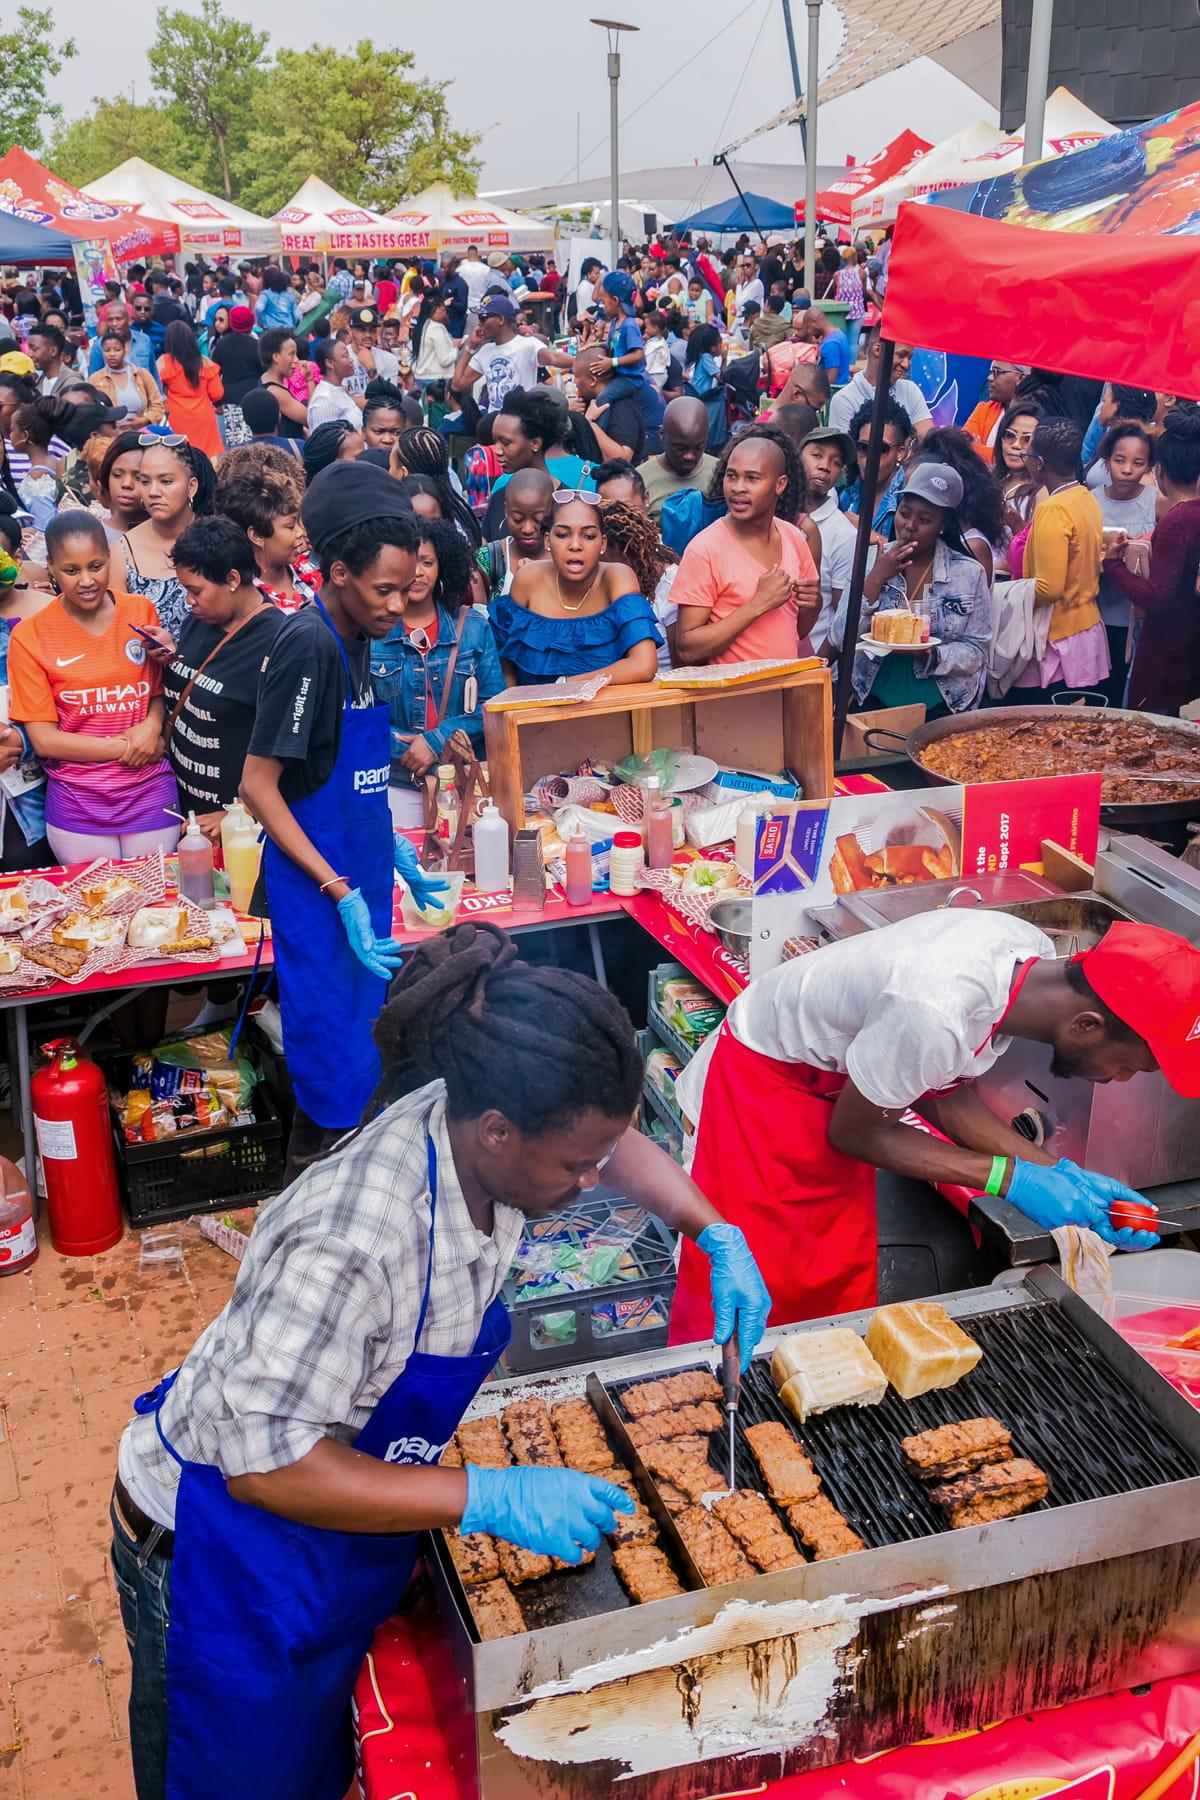 Outdoor festival in Johannesburg